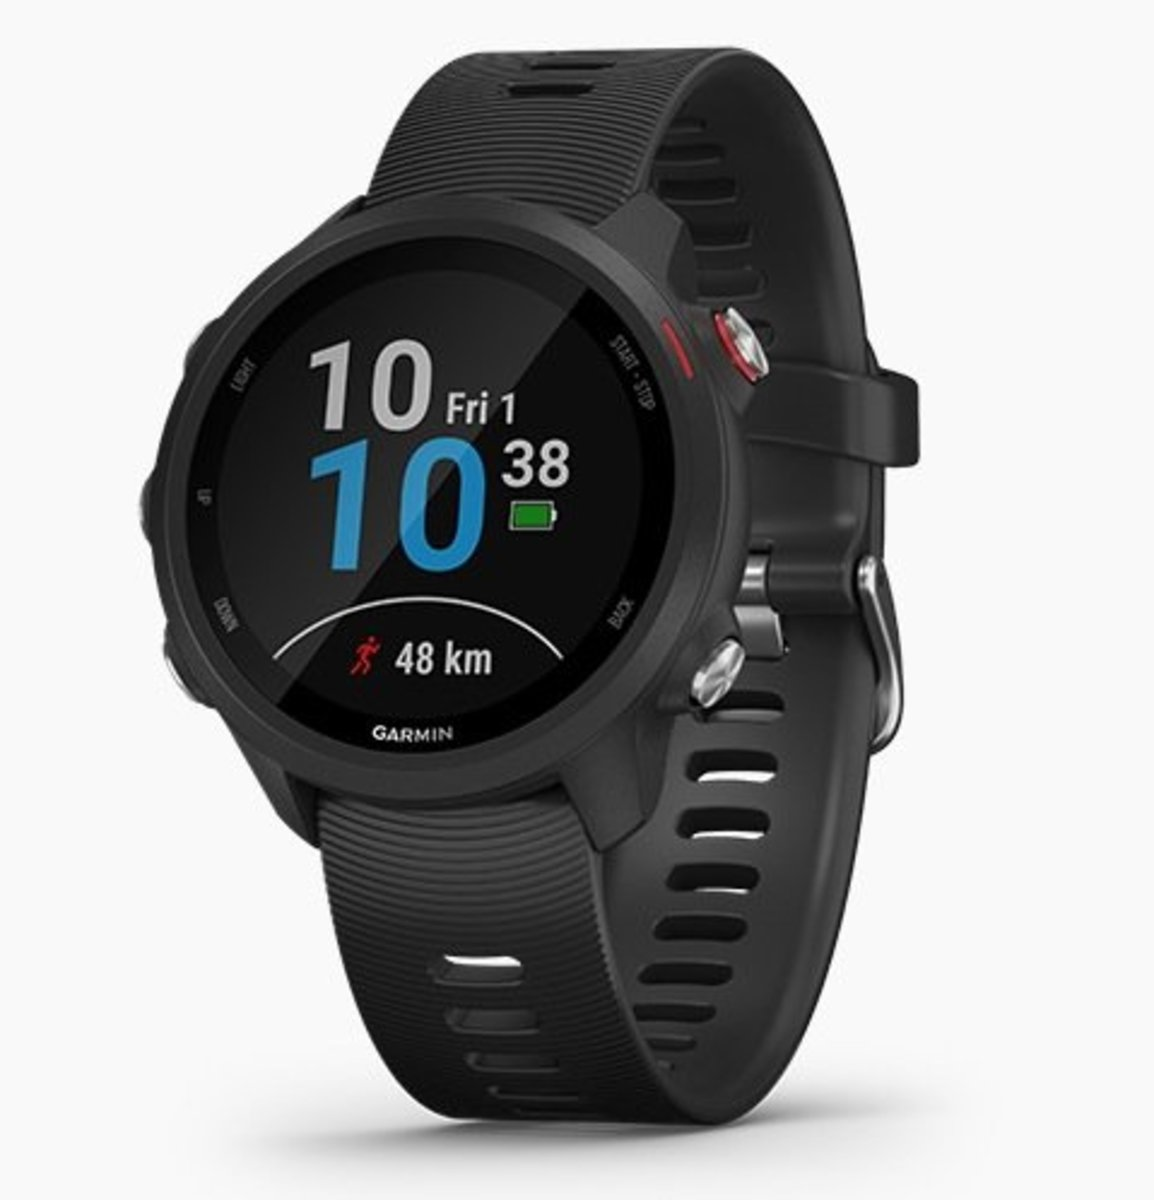 Forerunner 245 Music 進階跑步訓練GPS智能手錶[英文][黑色]